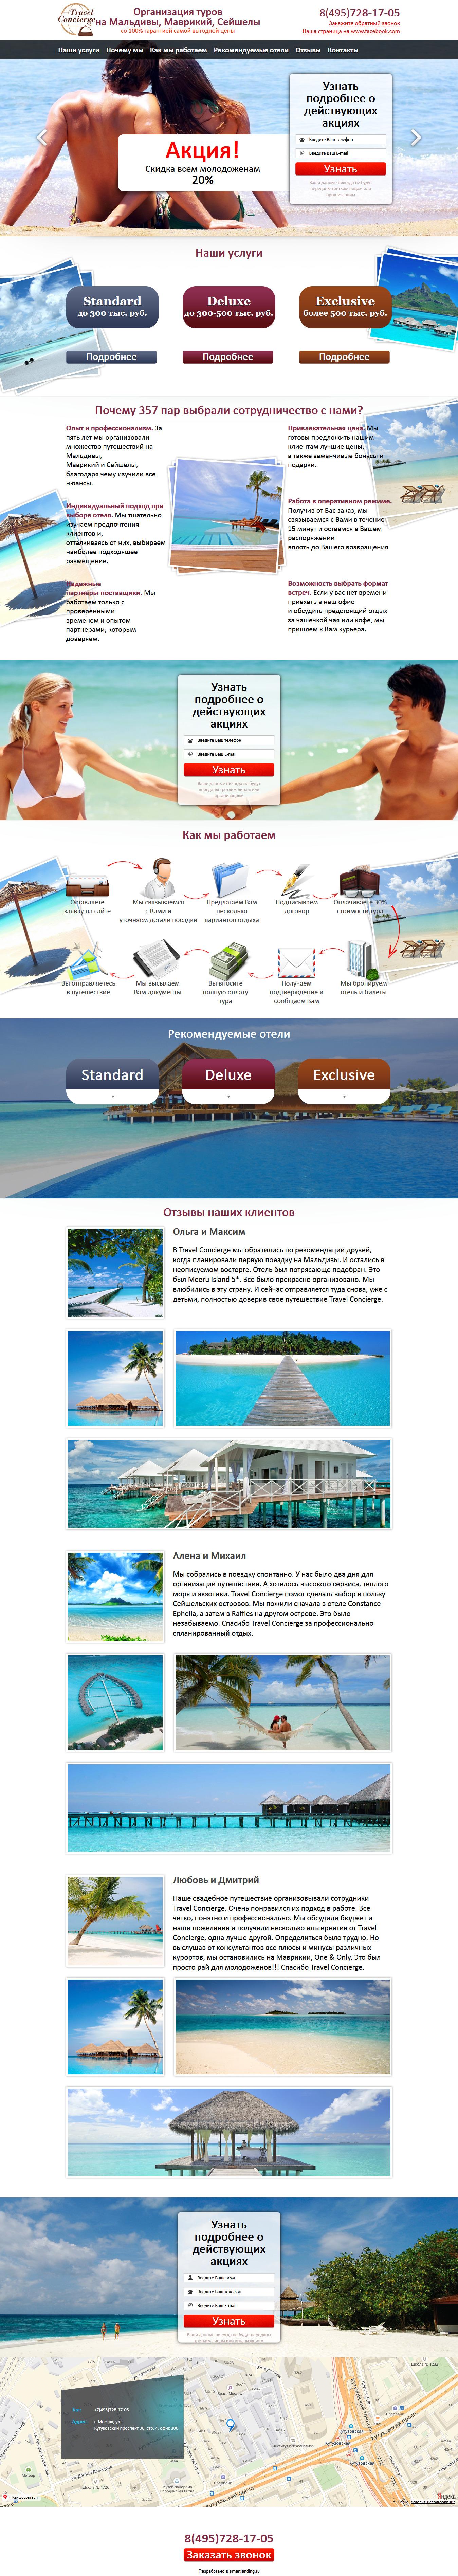 Шаблон лендинга: Организация туров